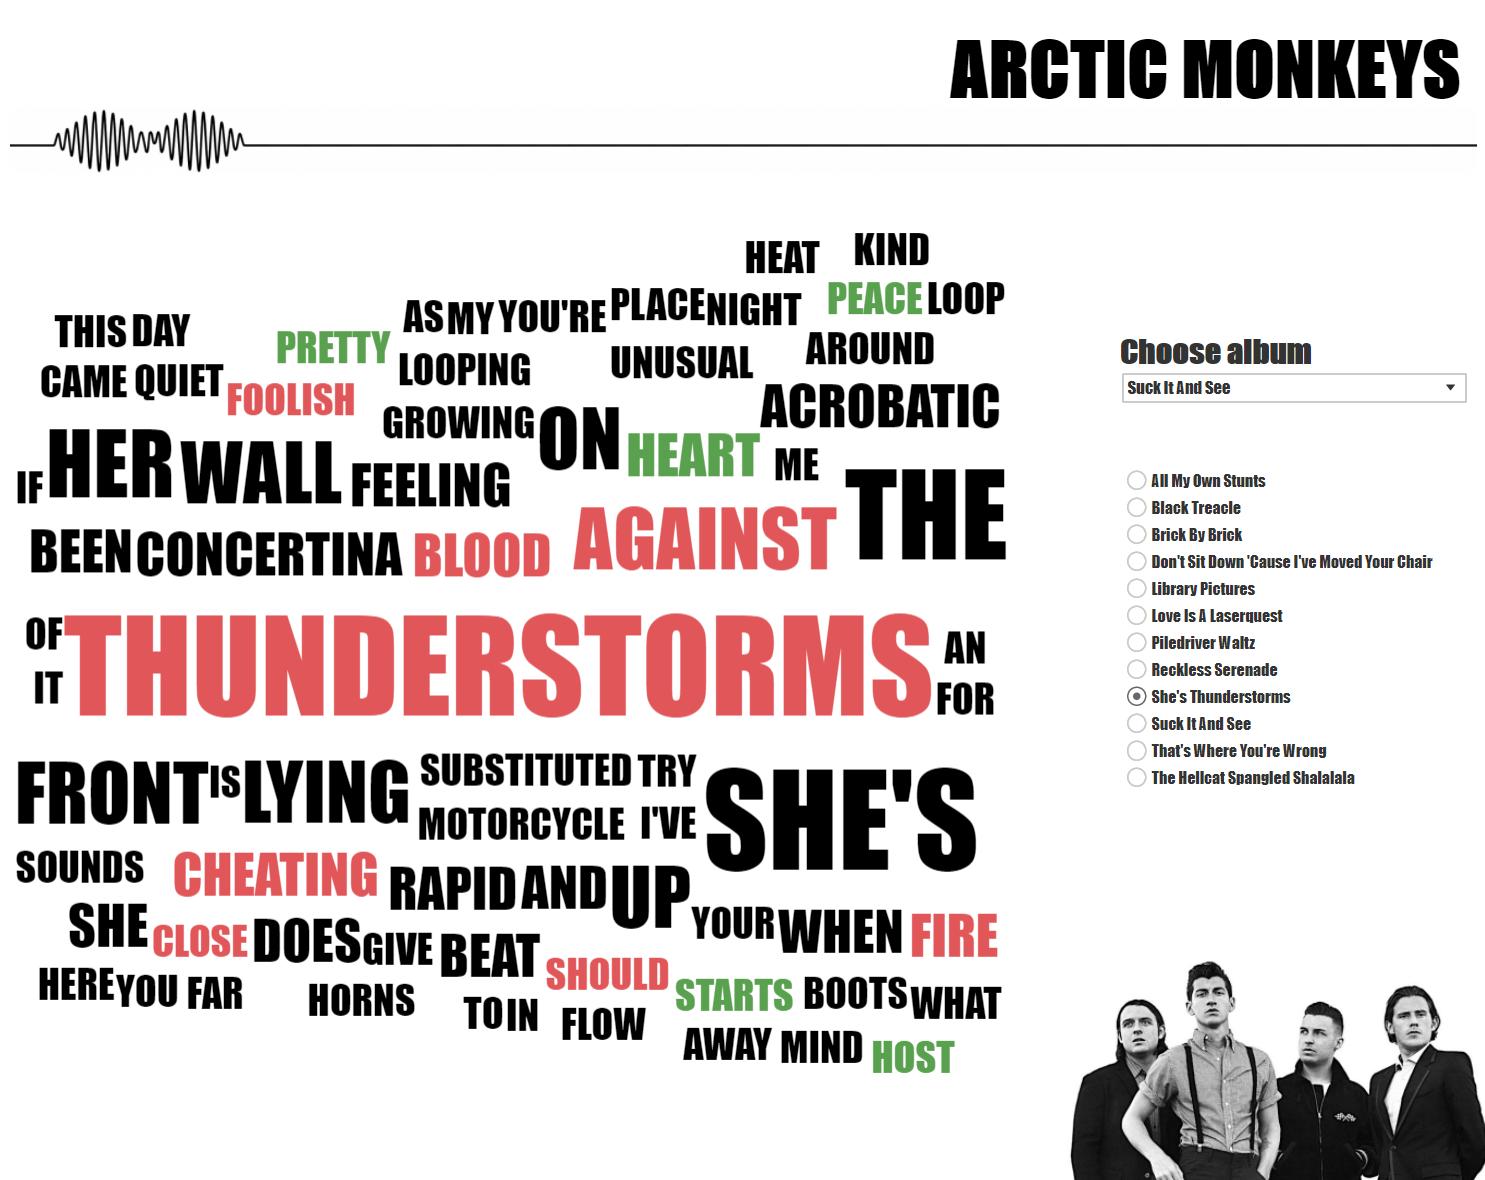 FireShot Capture 9 - Arctic Monkeys discography - Judit Bek_ - https___public.tableau.com_profile_